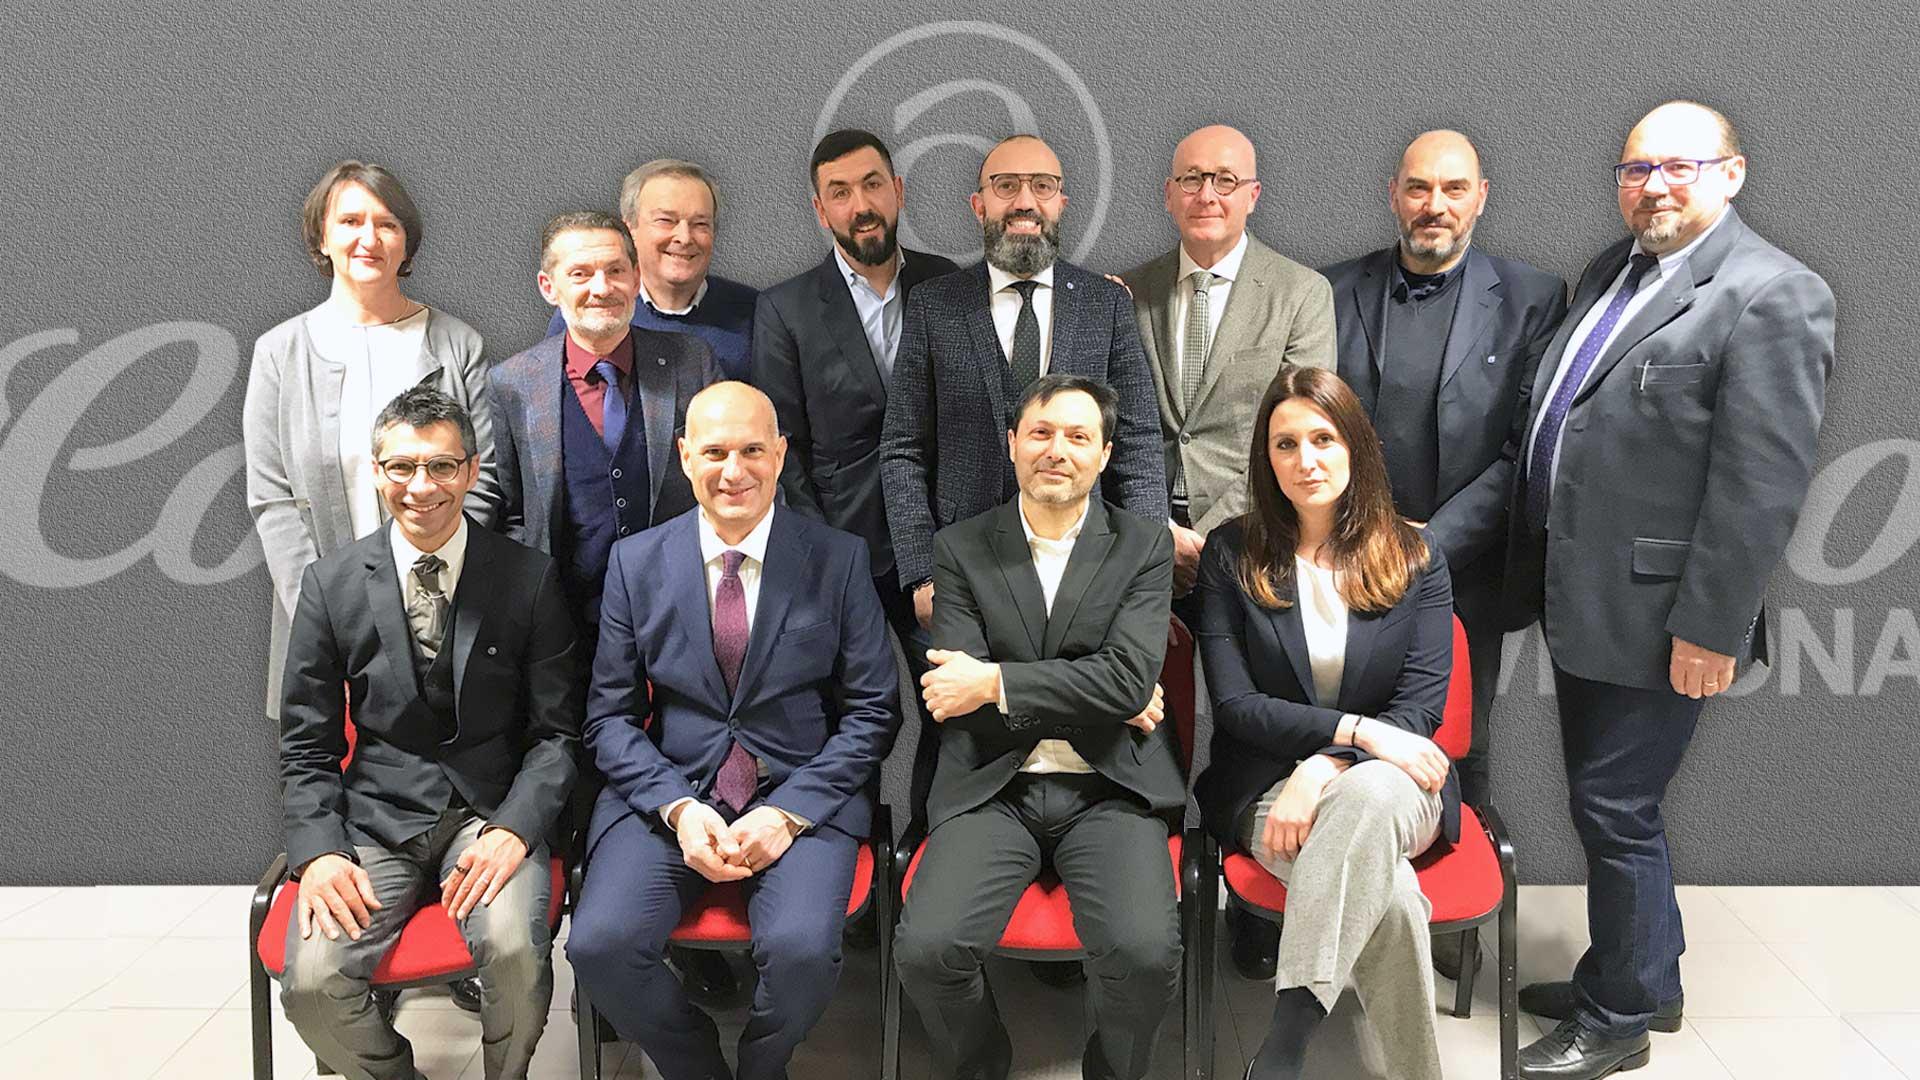 Confartigianato Imprese Verona Giunta 2020